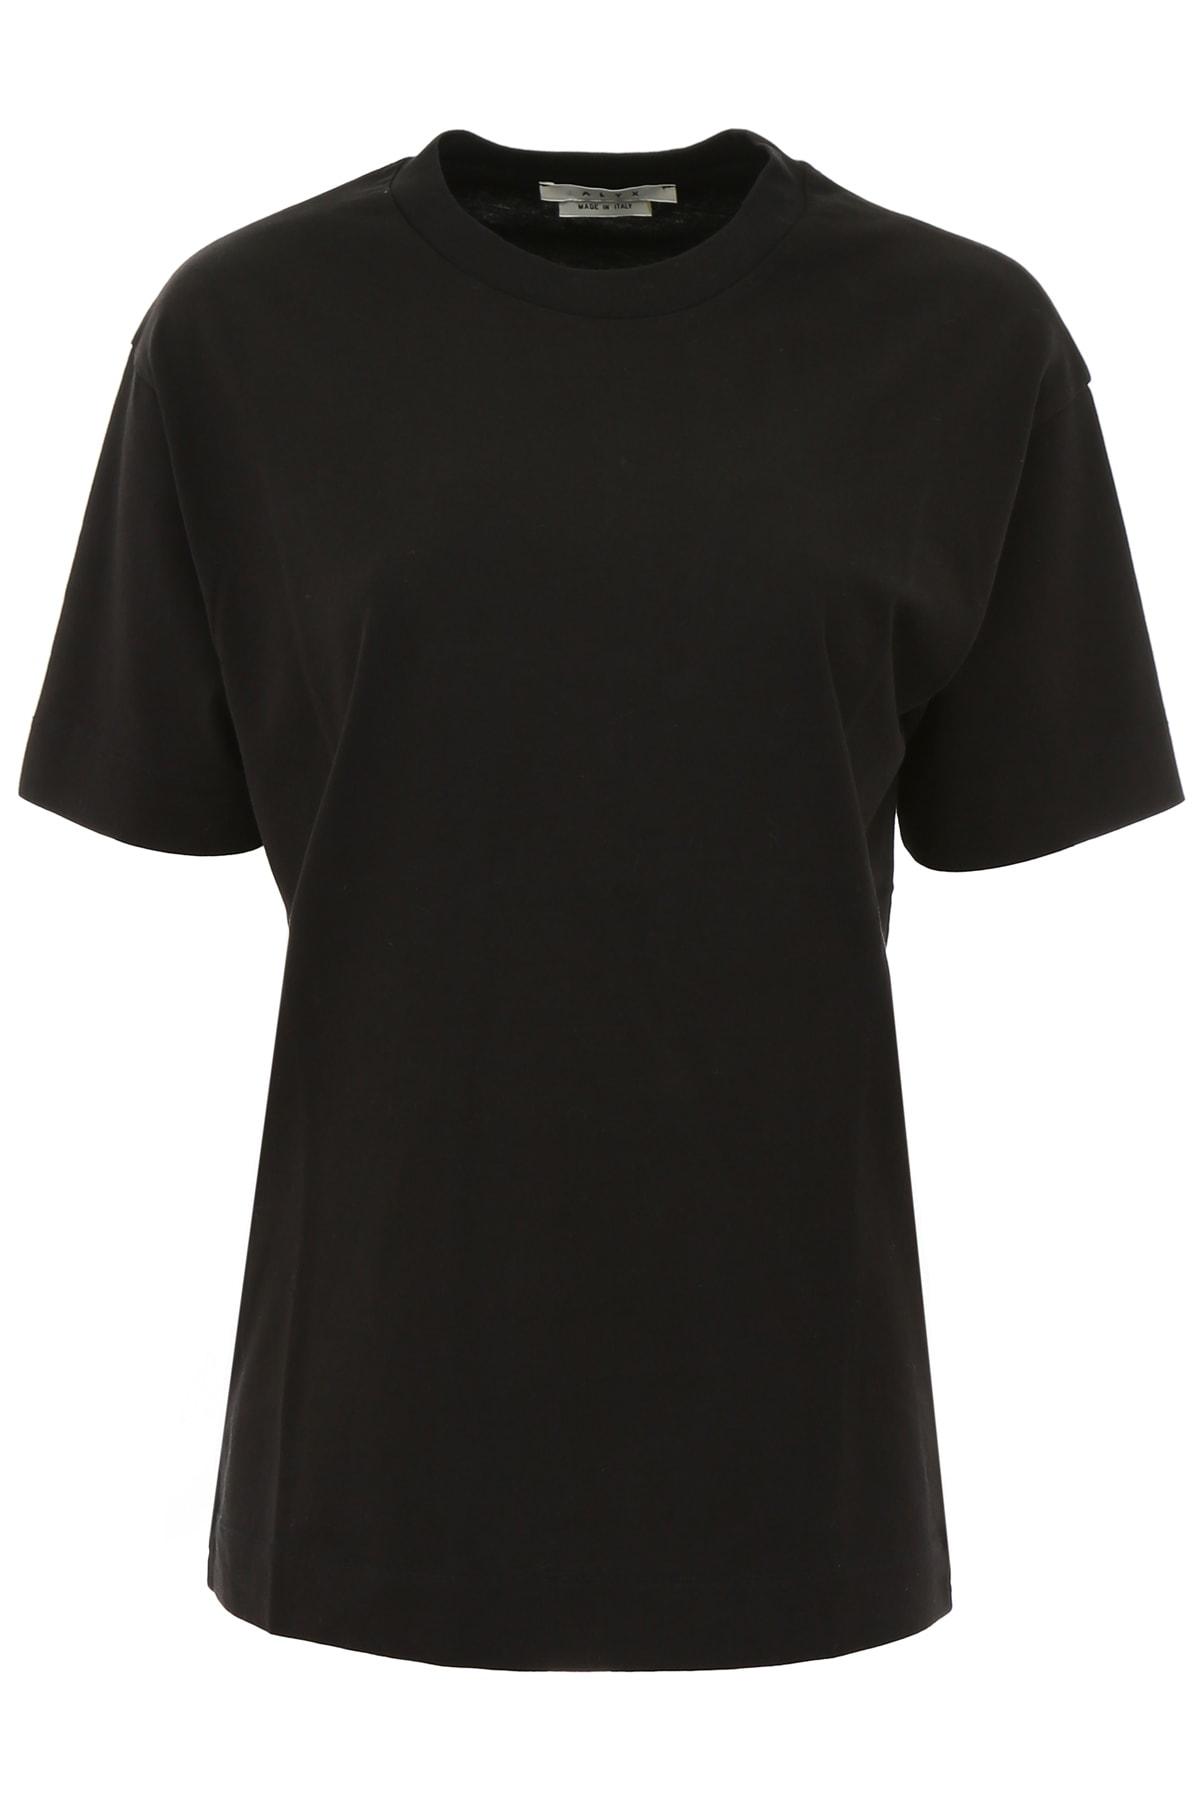 Alyx Tops Alyx Rainmaker T-shirt